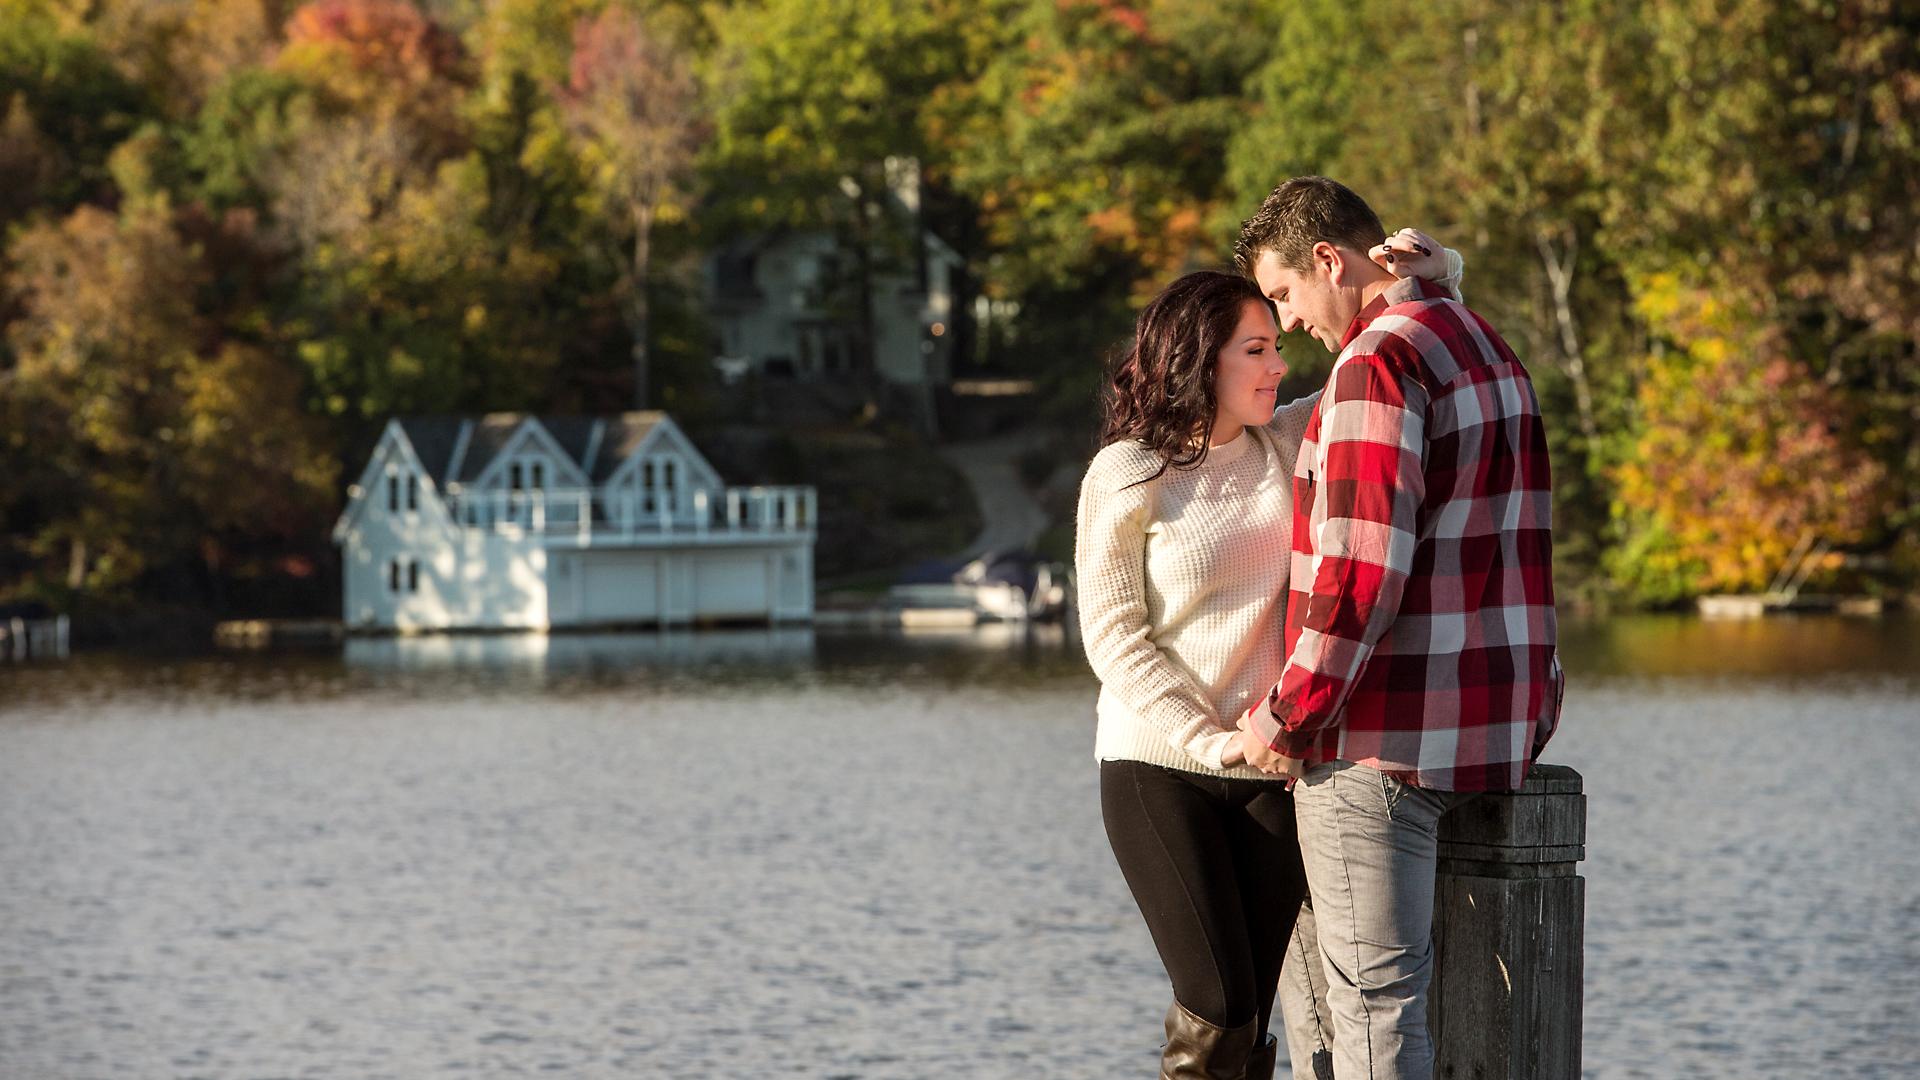 Will & Sarah | High Falls | Muskoka Engagement Photography11